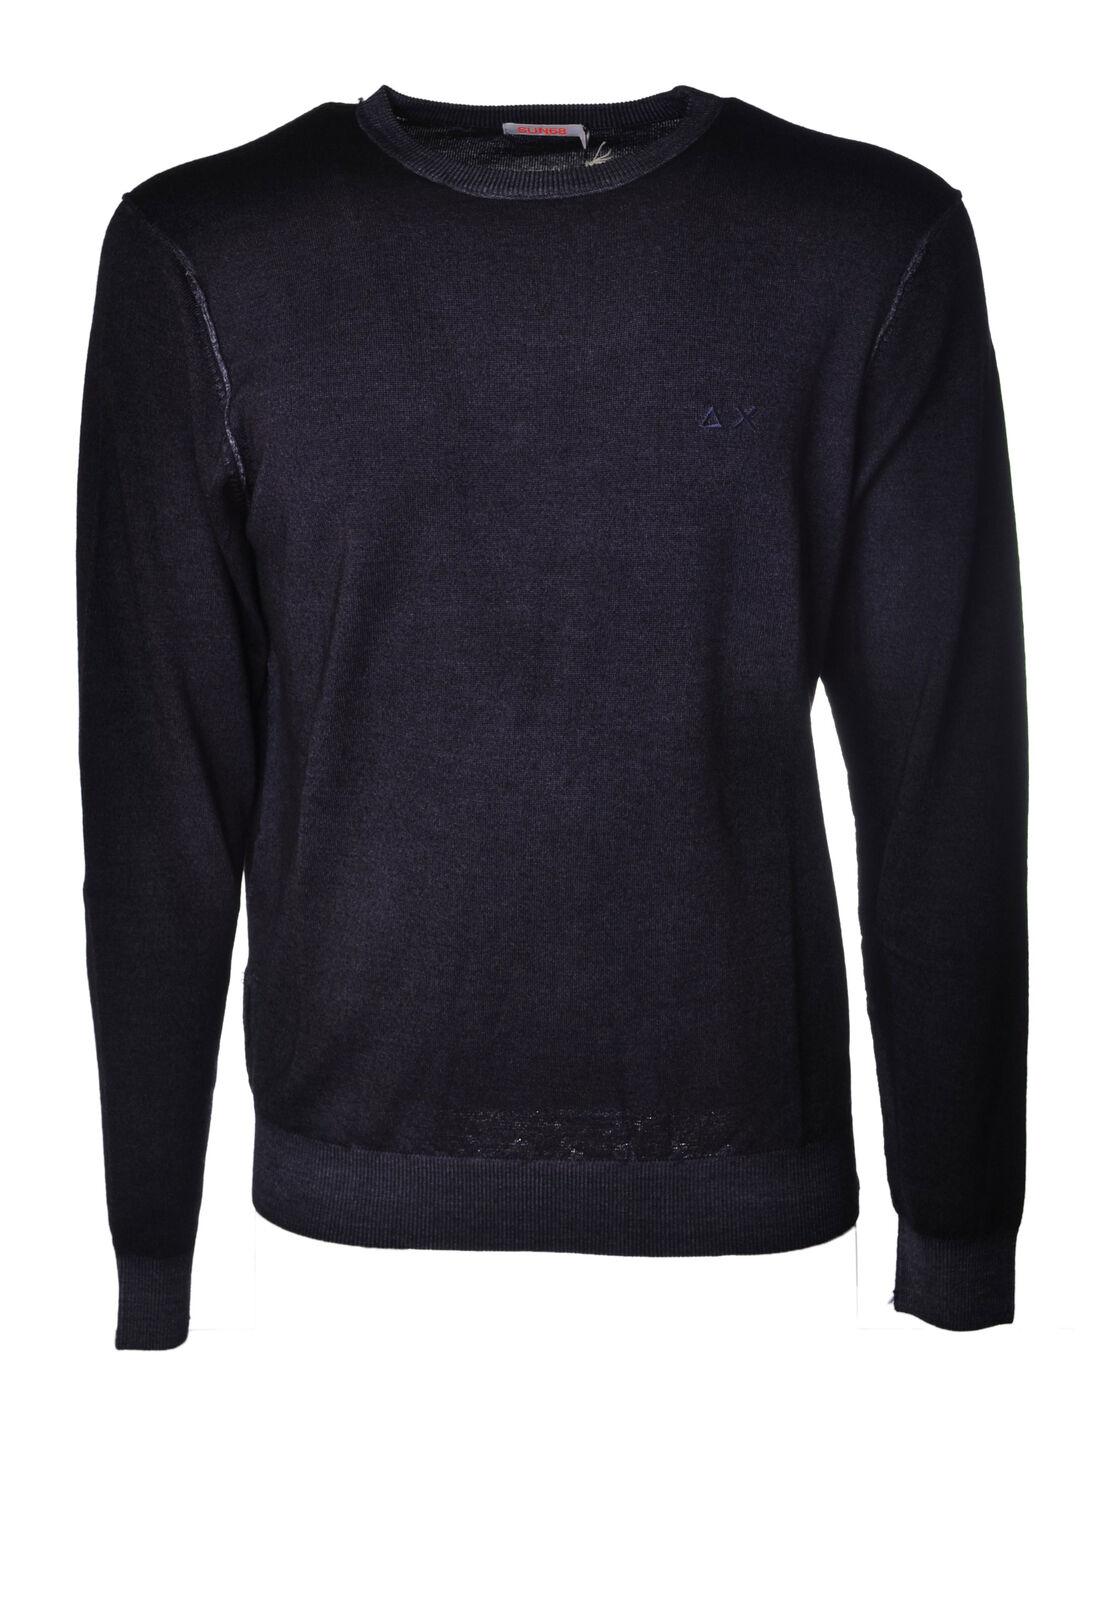 Sun 68  -  Sweaters - Male - bluee - 4017430A184818